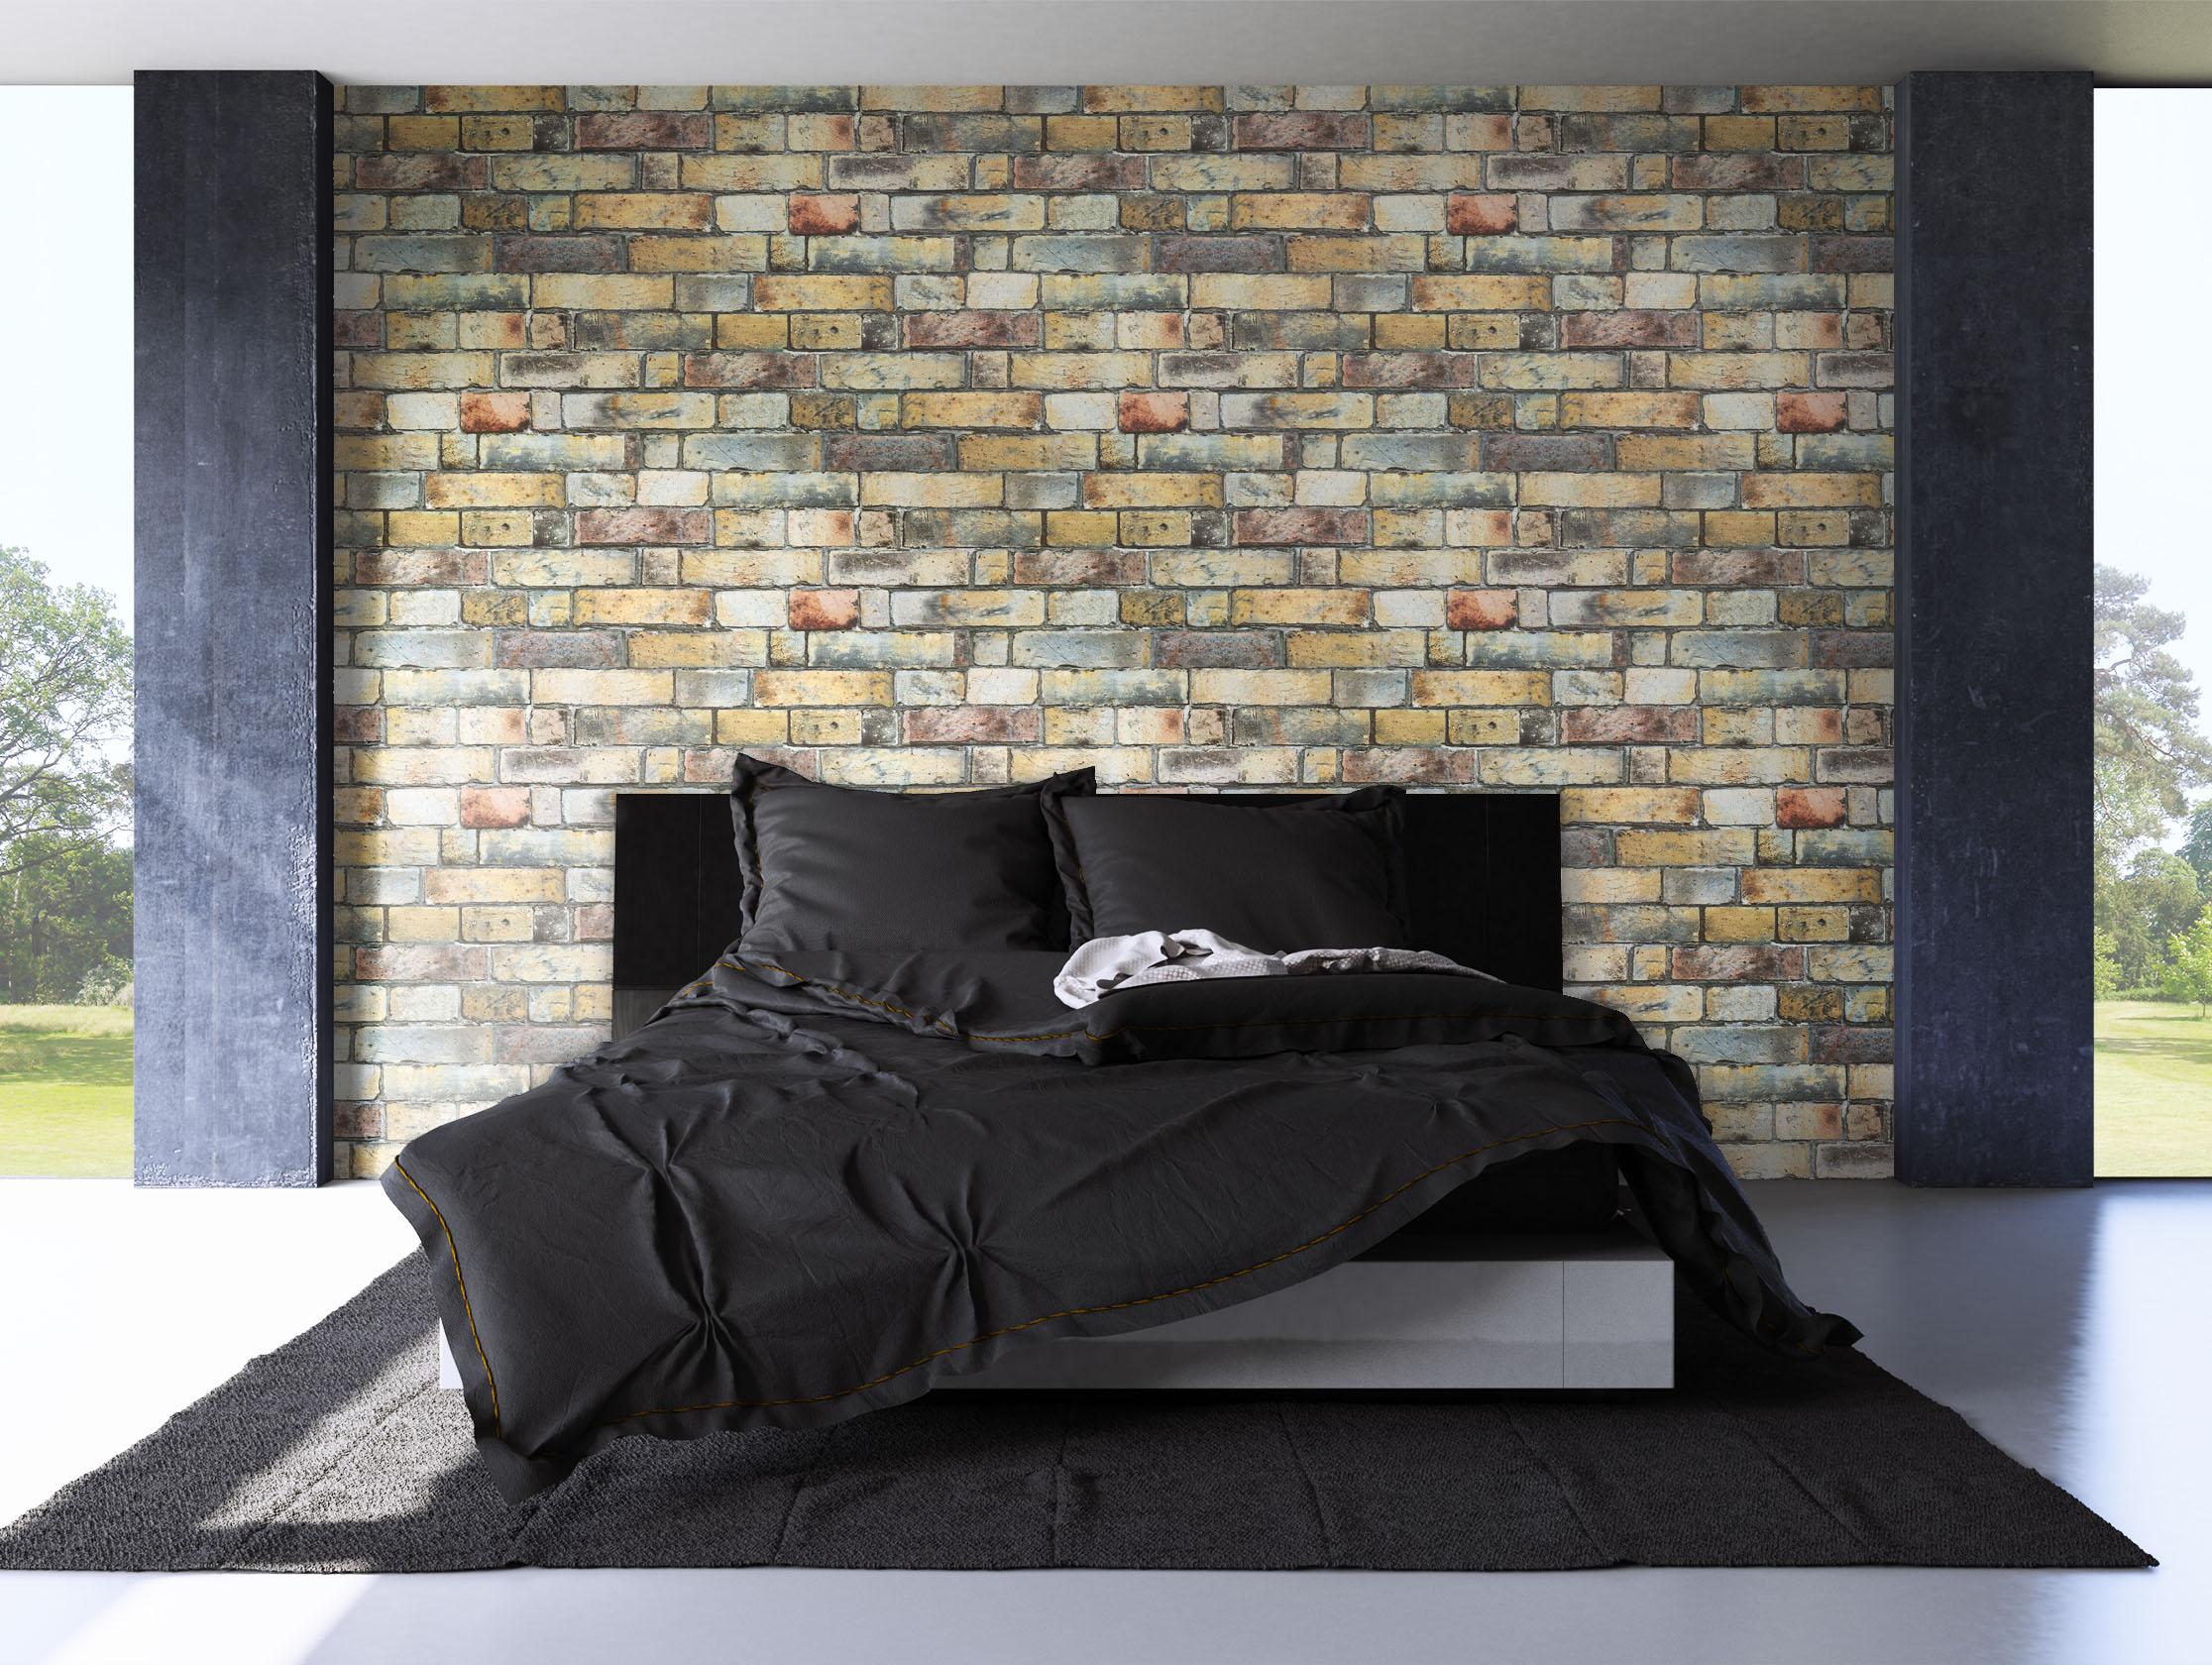 newroom steintapete vliestapete bunt mauer stein rustikal grau loft 3d ebay. Black Bedroom Furniture Sets. Home Design Ideas